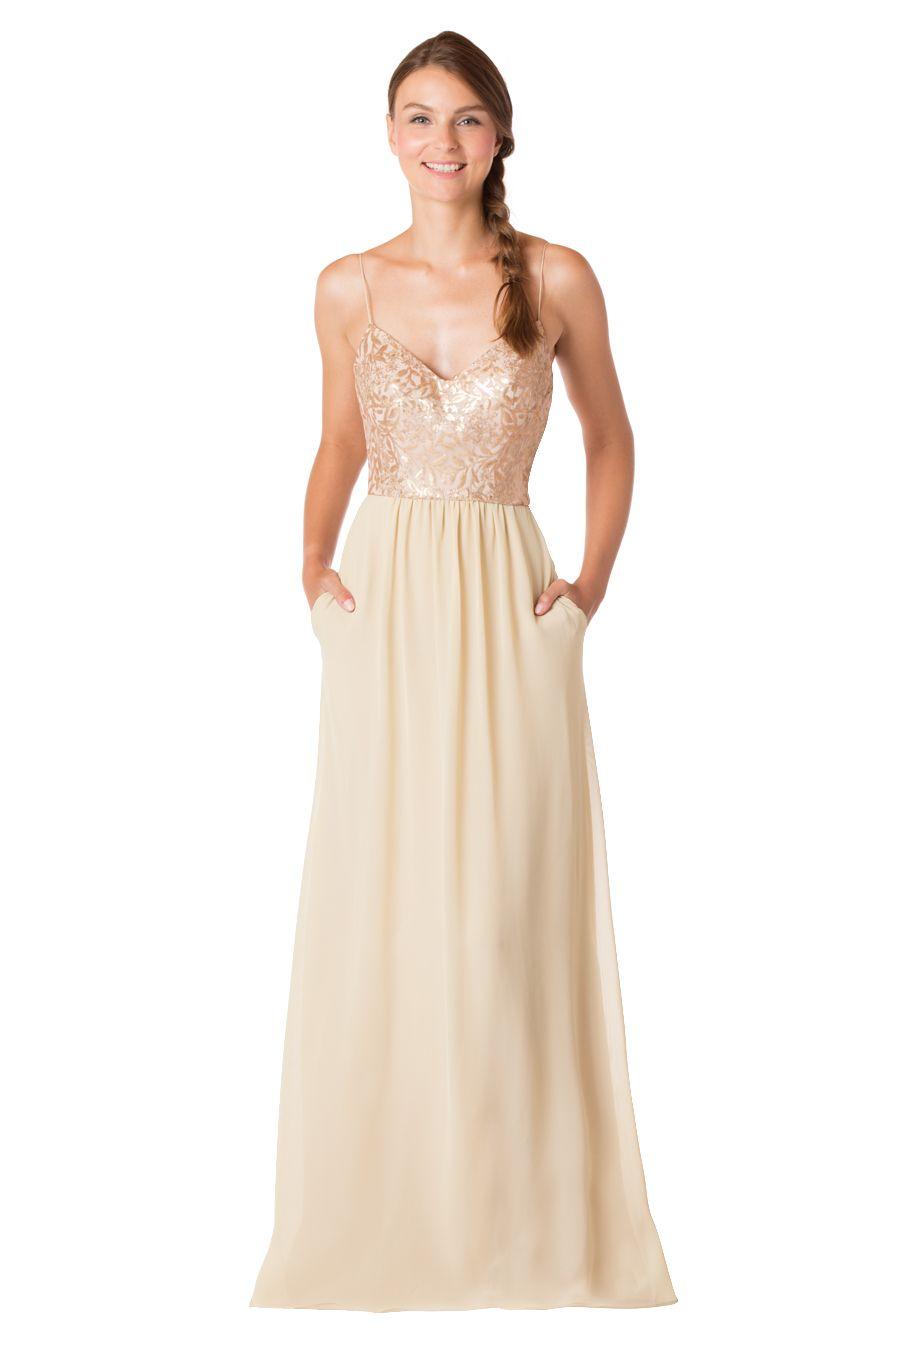 Bari Jay Fashions ( STYLE 1705 and 1705-S (Short Version)  Available at Enchantment Bridal in Chatham, On. 519-360-1100